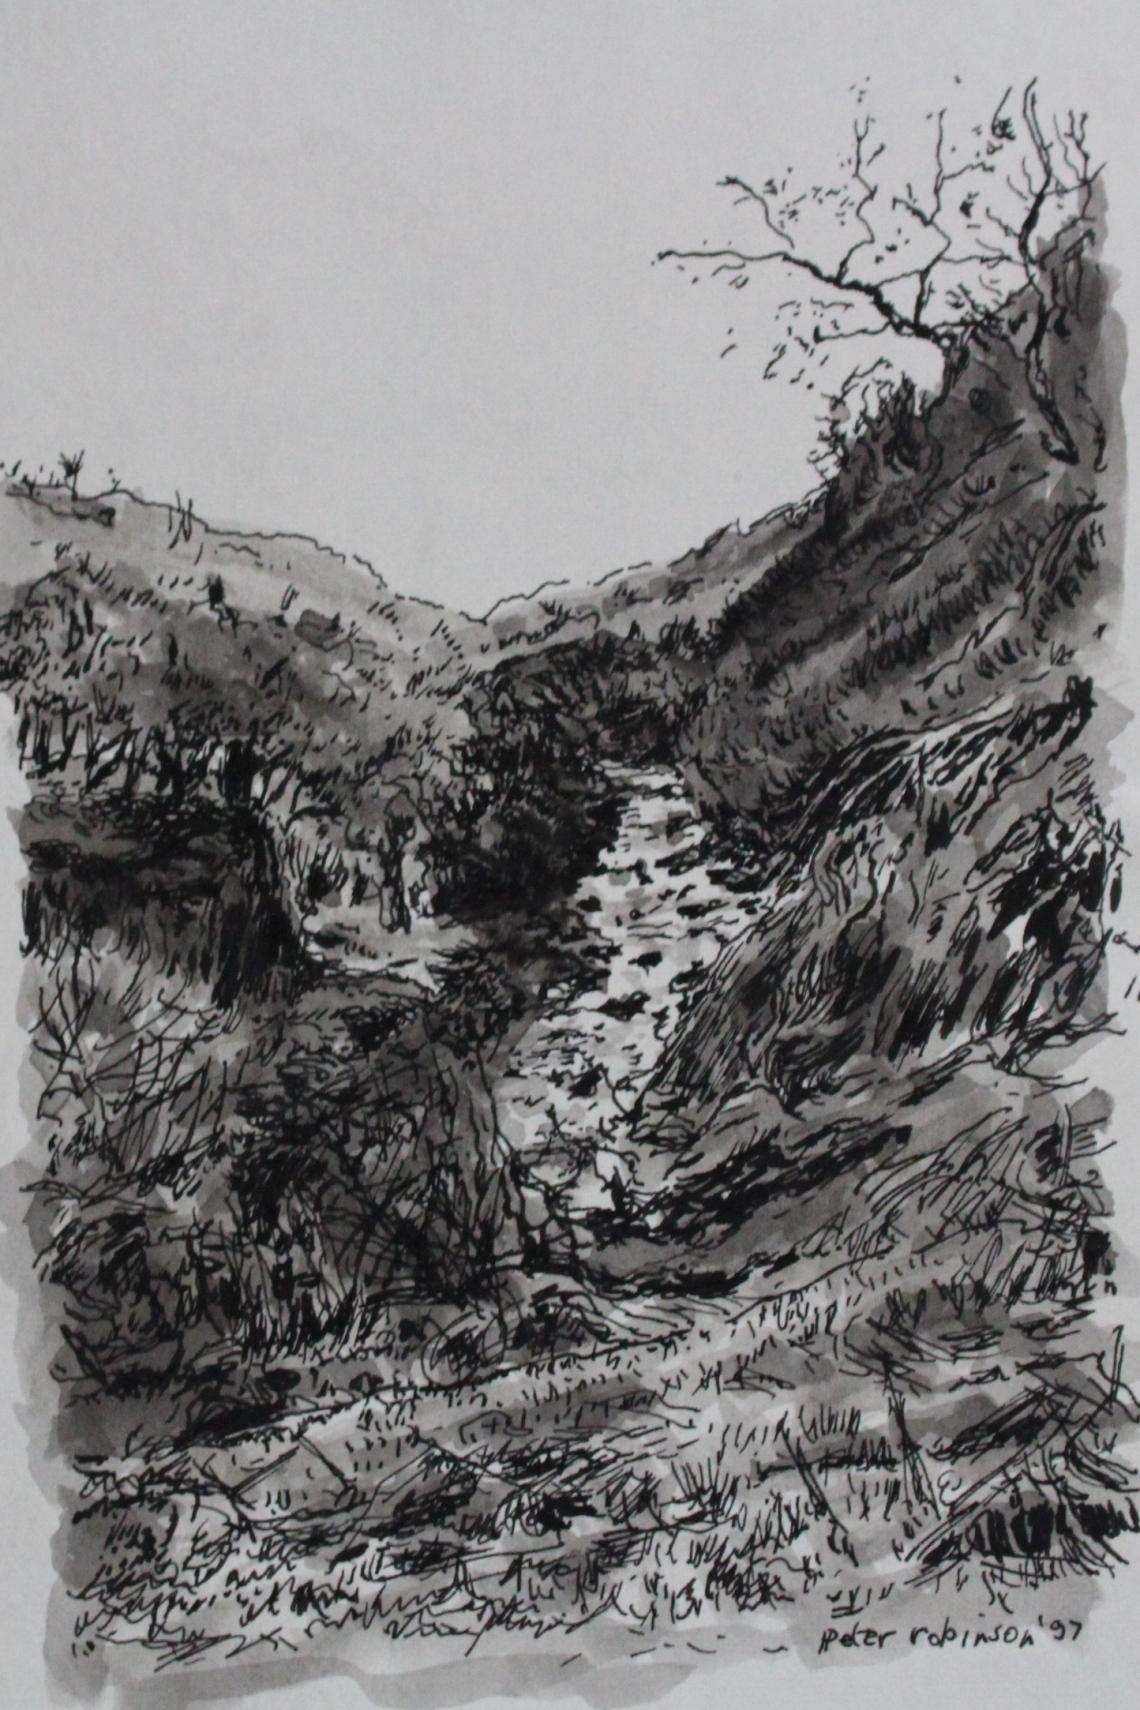 arigna river source